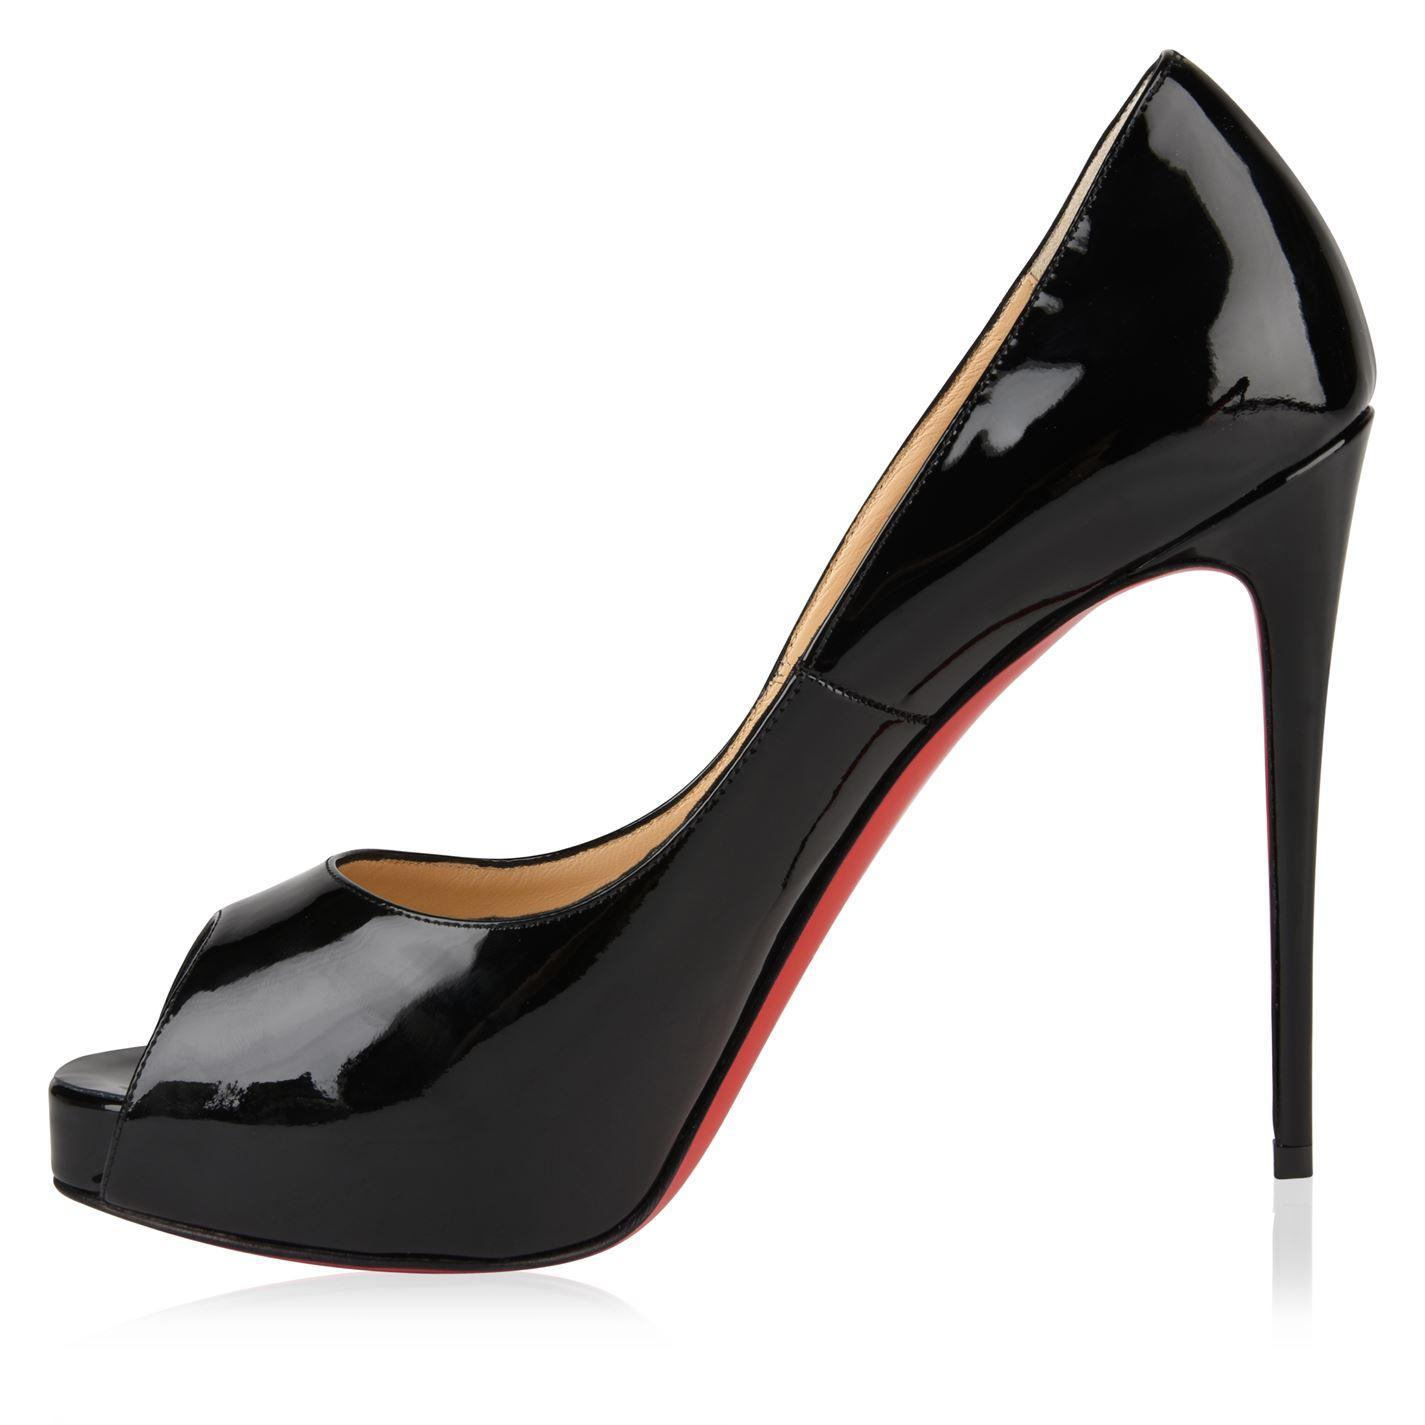 dba5b27fde4 Lyst - Christian Louboutin Very Prive Patent Heels in Black